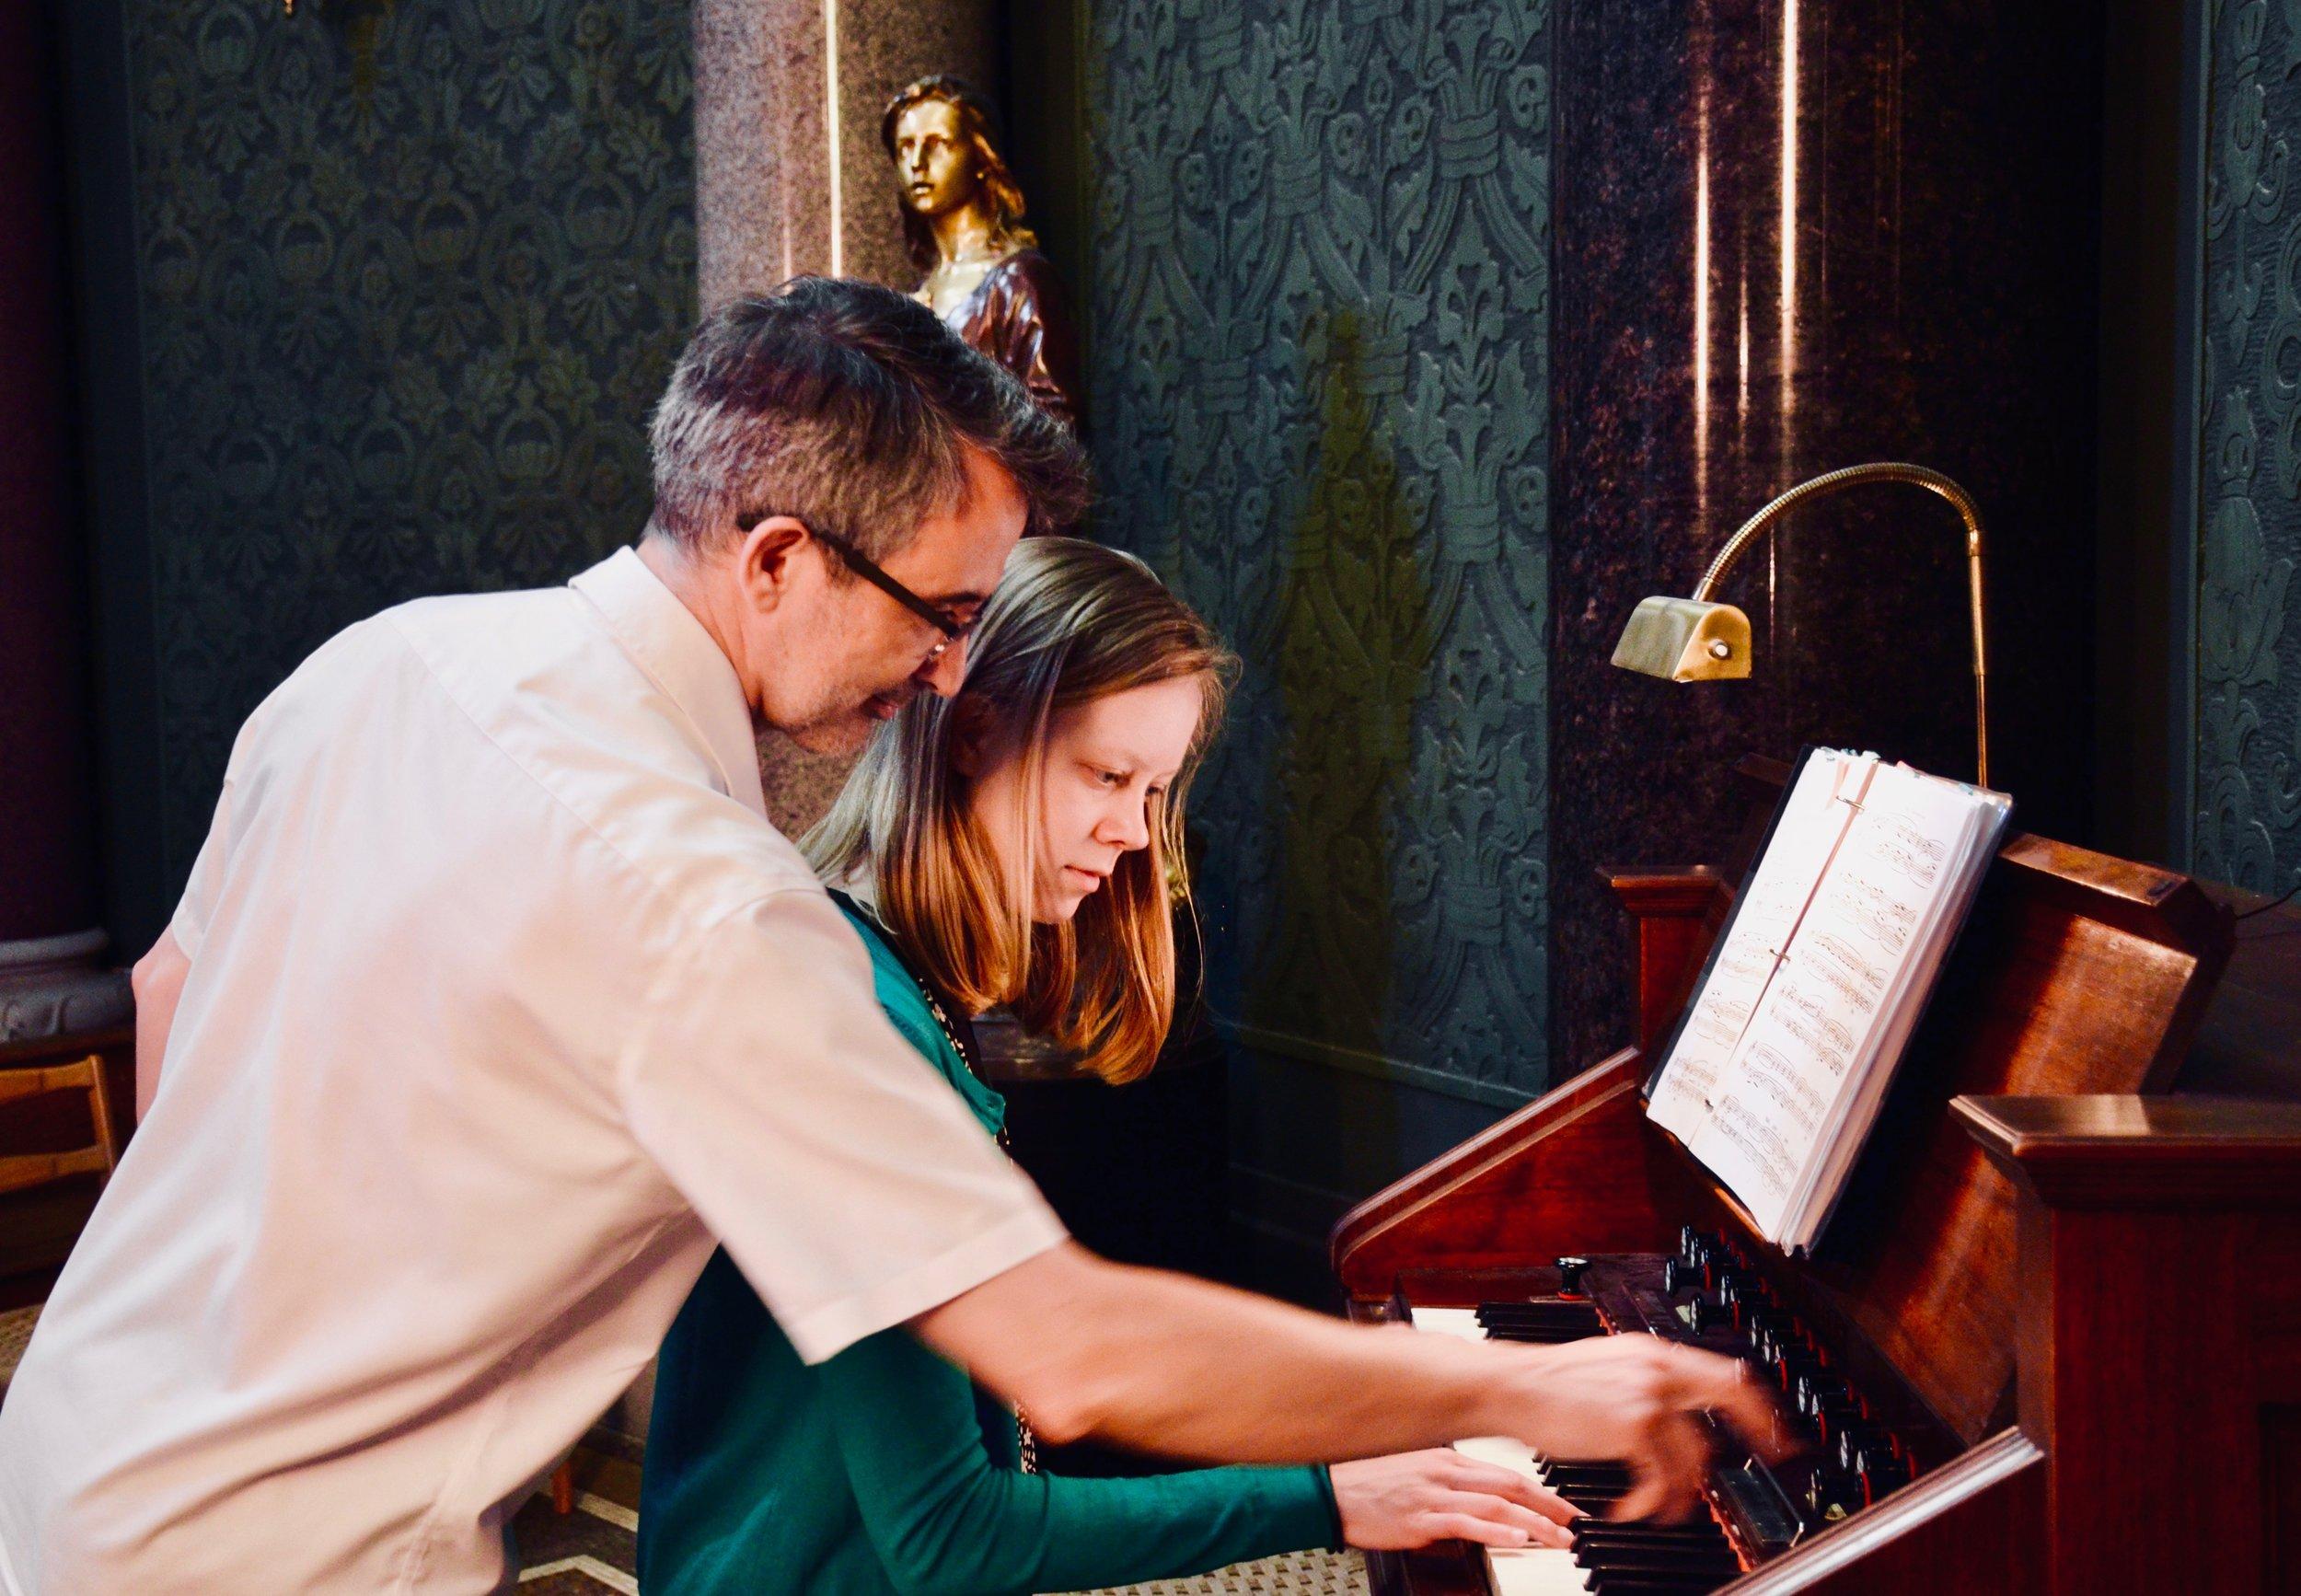 Sven Verner Olsen assists Laura Gullett at the harmonium, Jesuskirke, Copenhagen.